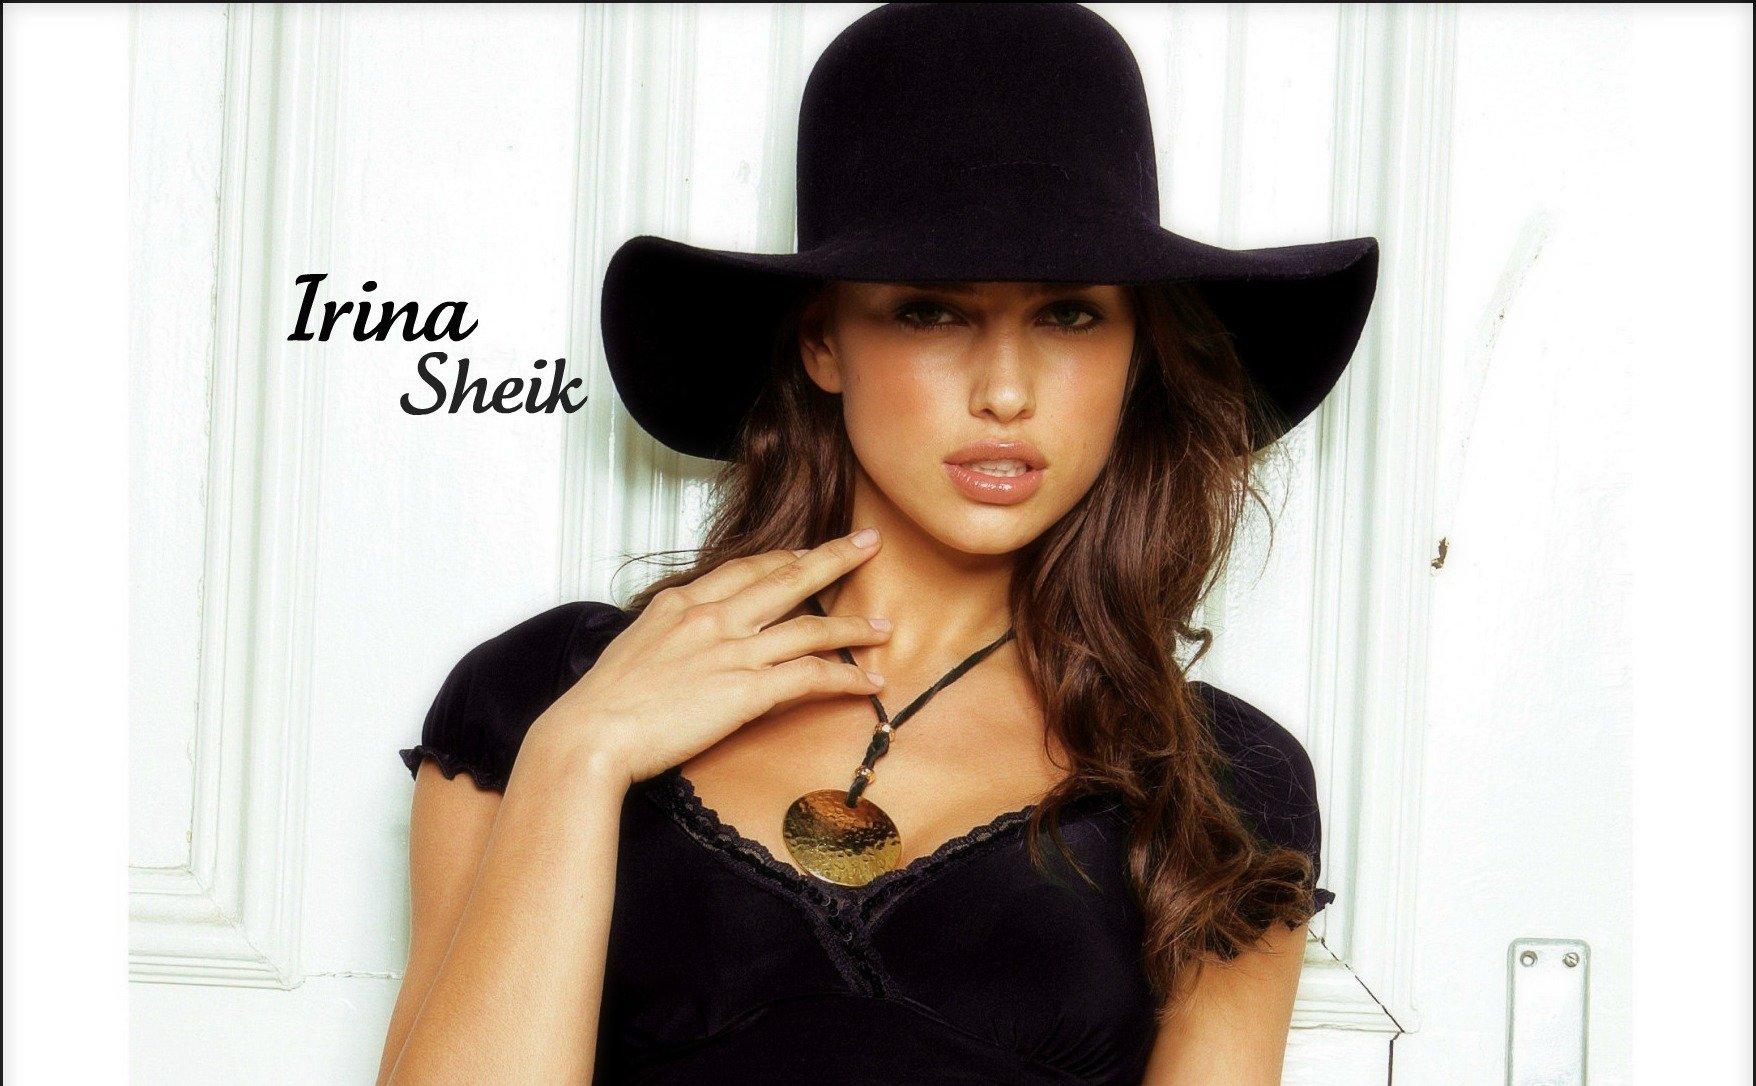 Celebrita' - Irina Shayk  Bellissime Woman Modelle Sfondo